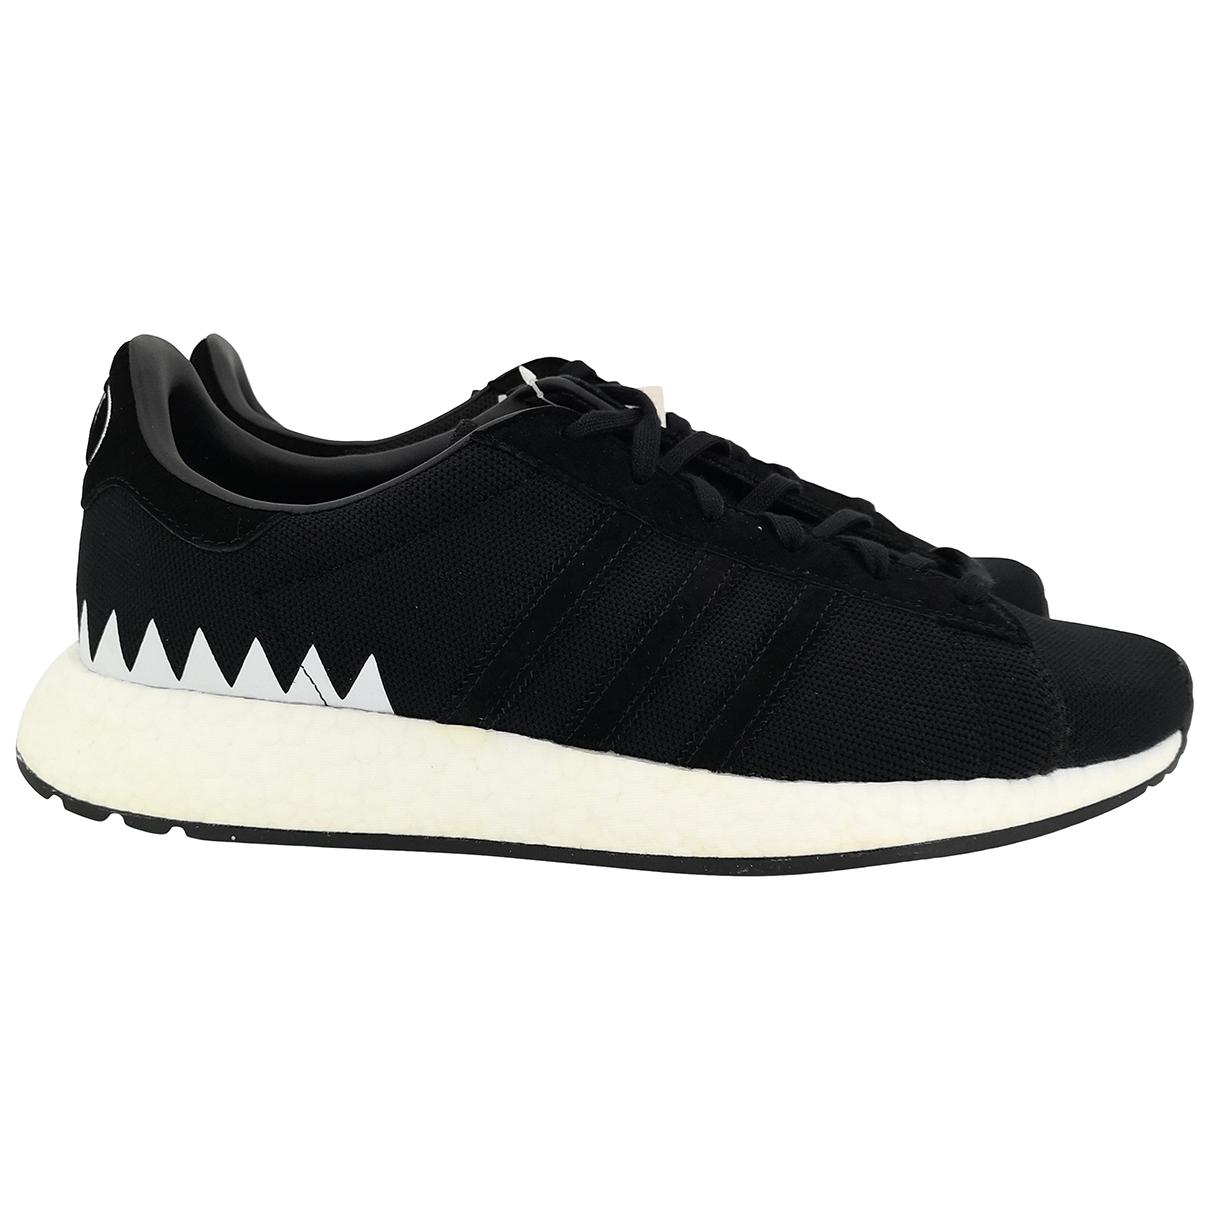 Adidas X Neighborhood - Baskets   pour homme en cuir - noir